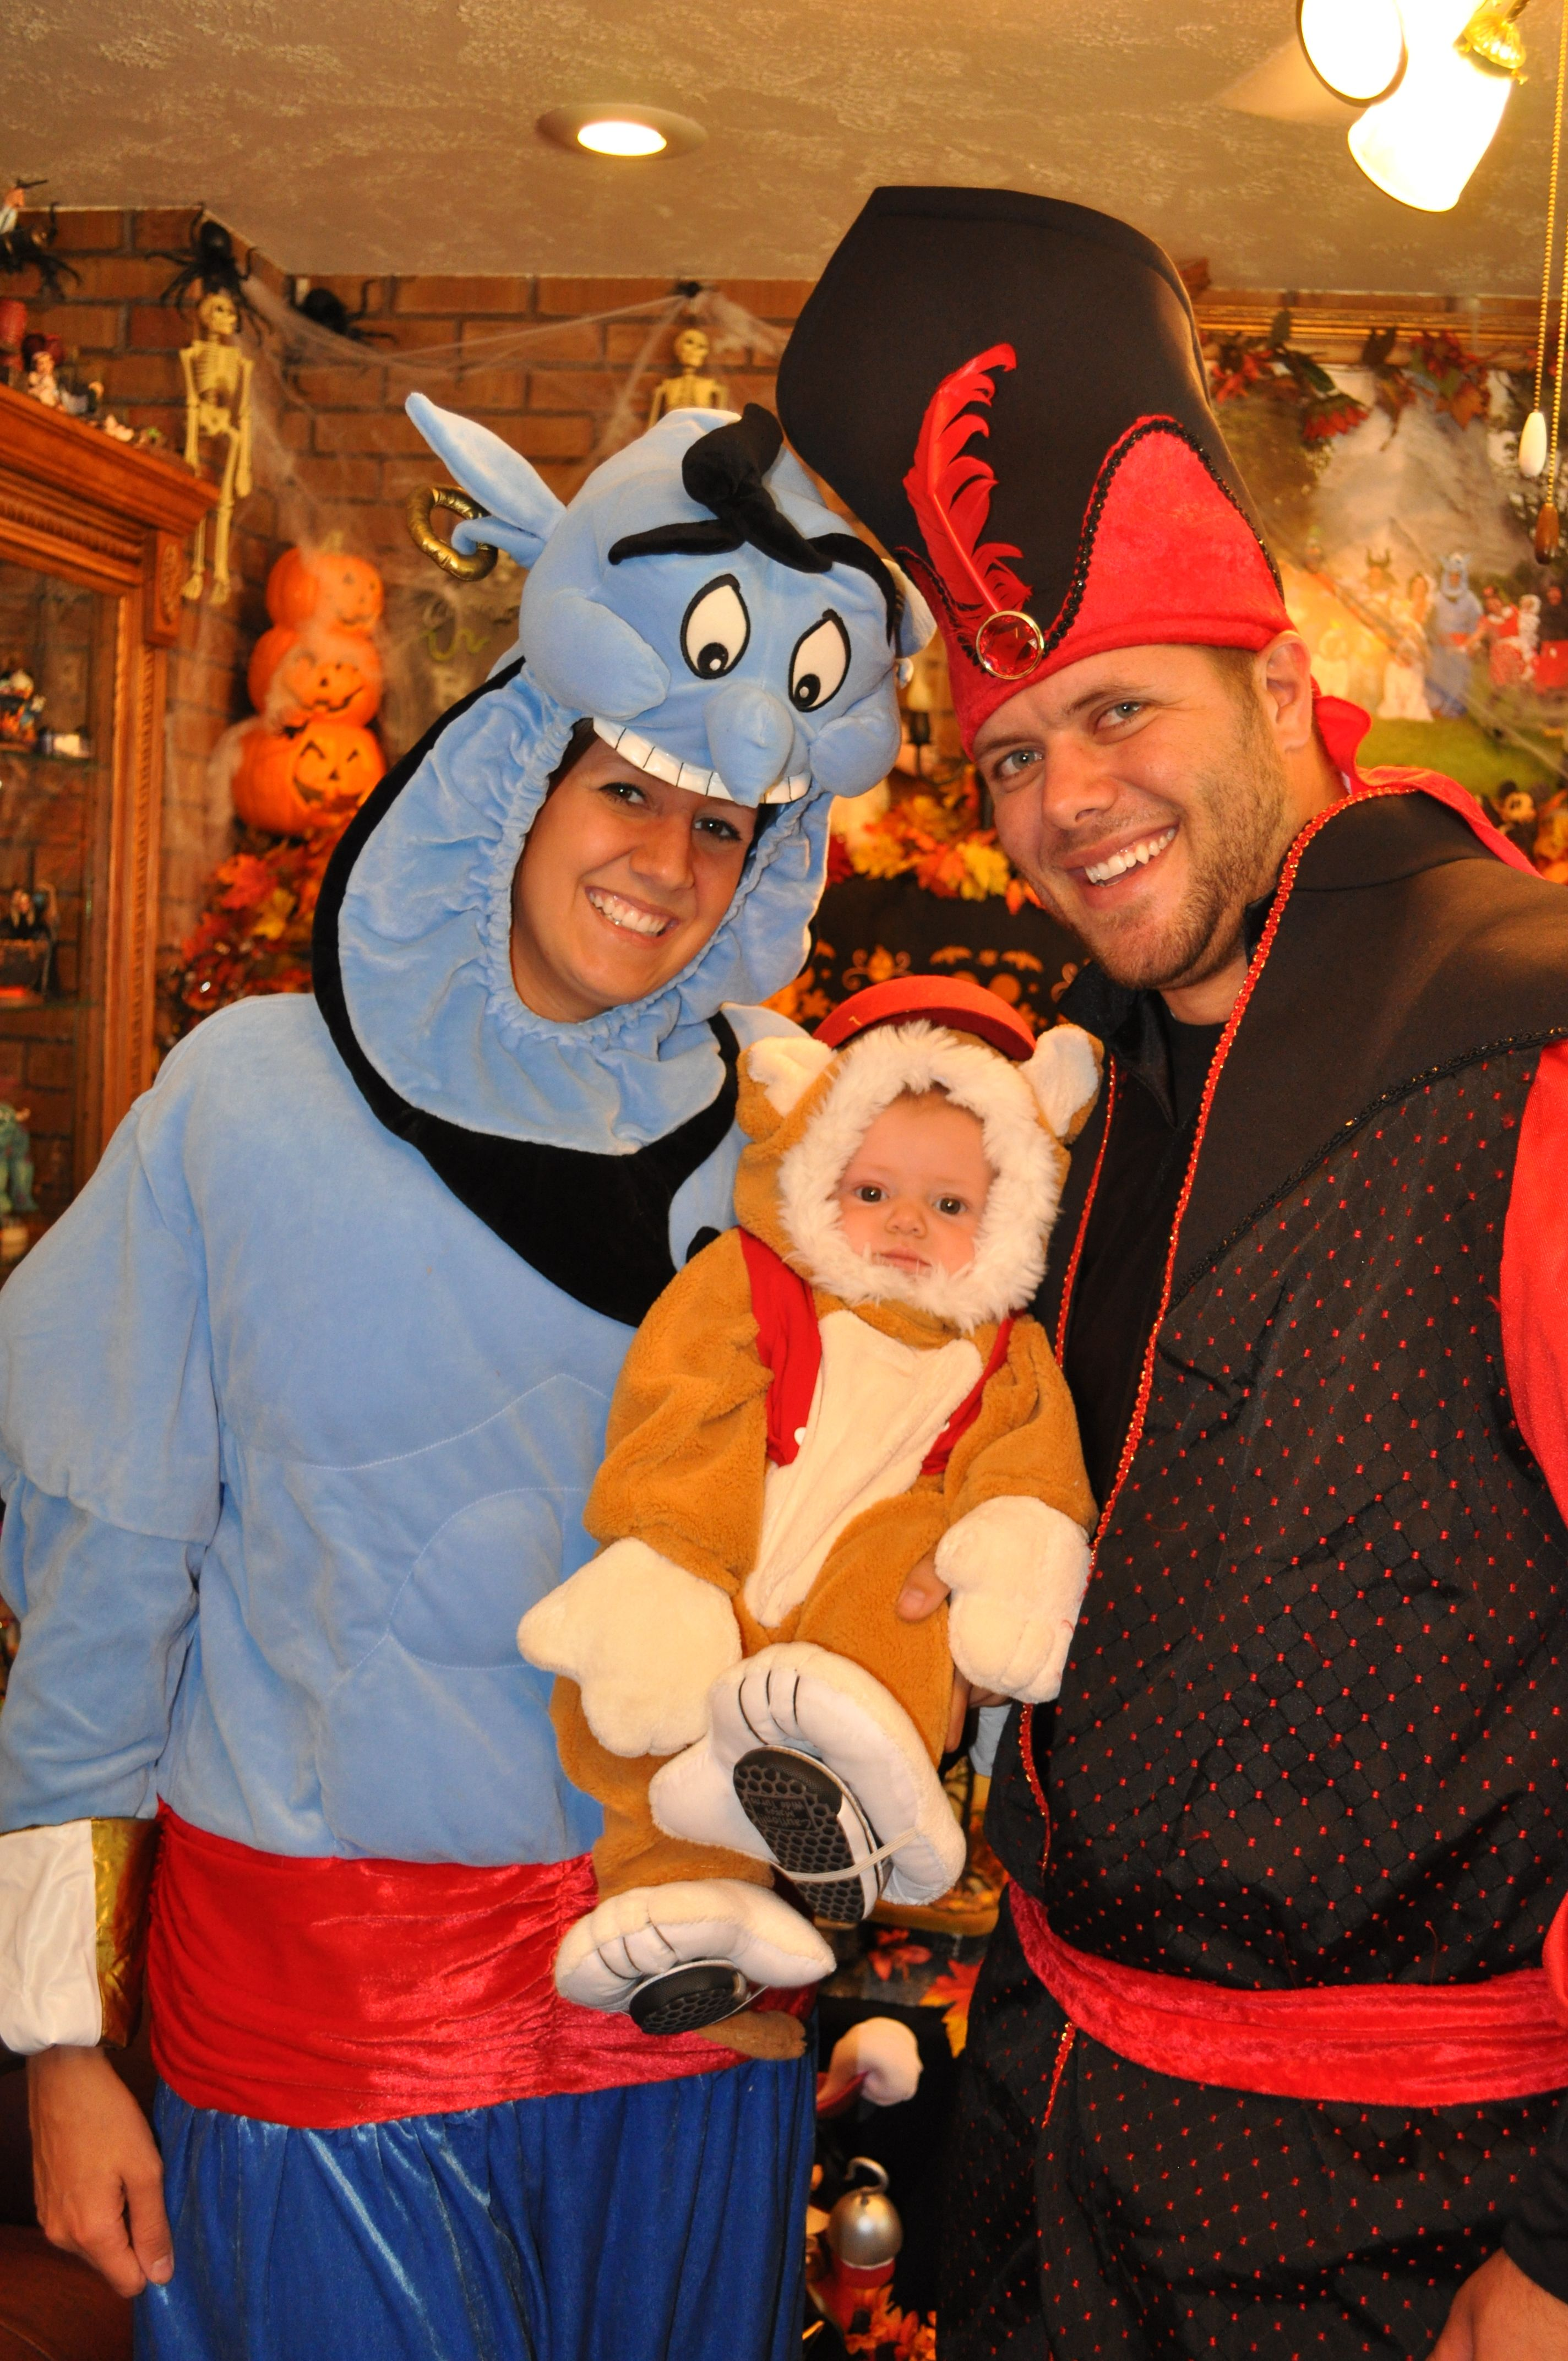 Disney Aladdin Genie Abu And Jafar Costumes Wwwmydisneylove